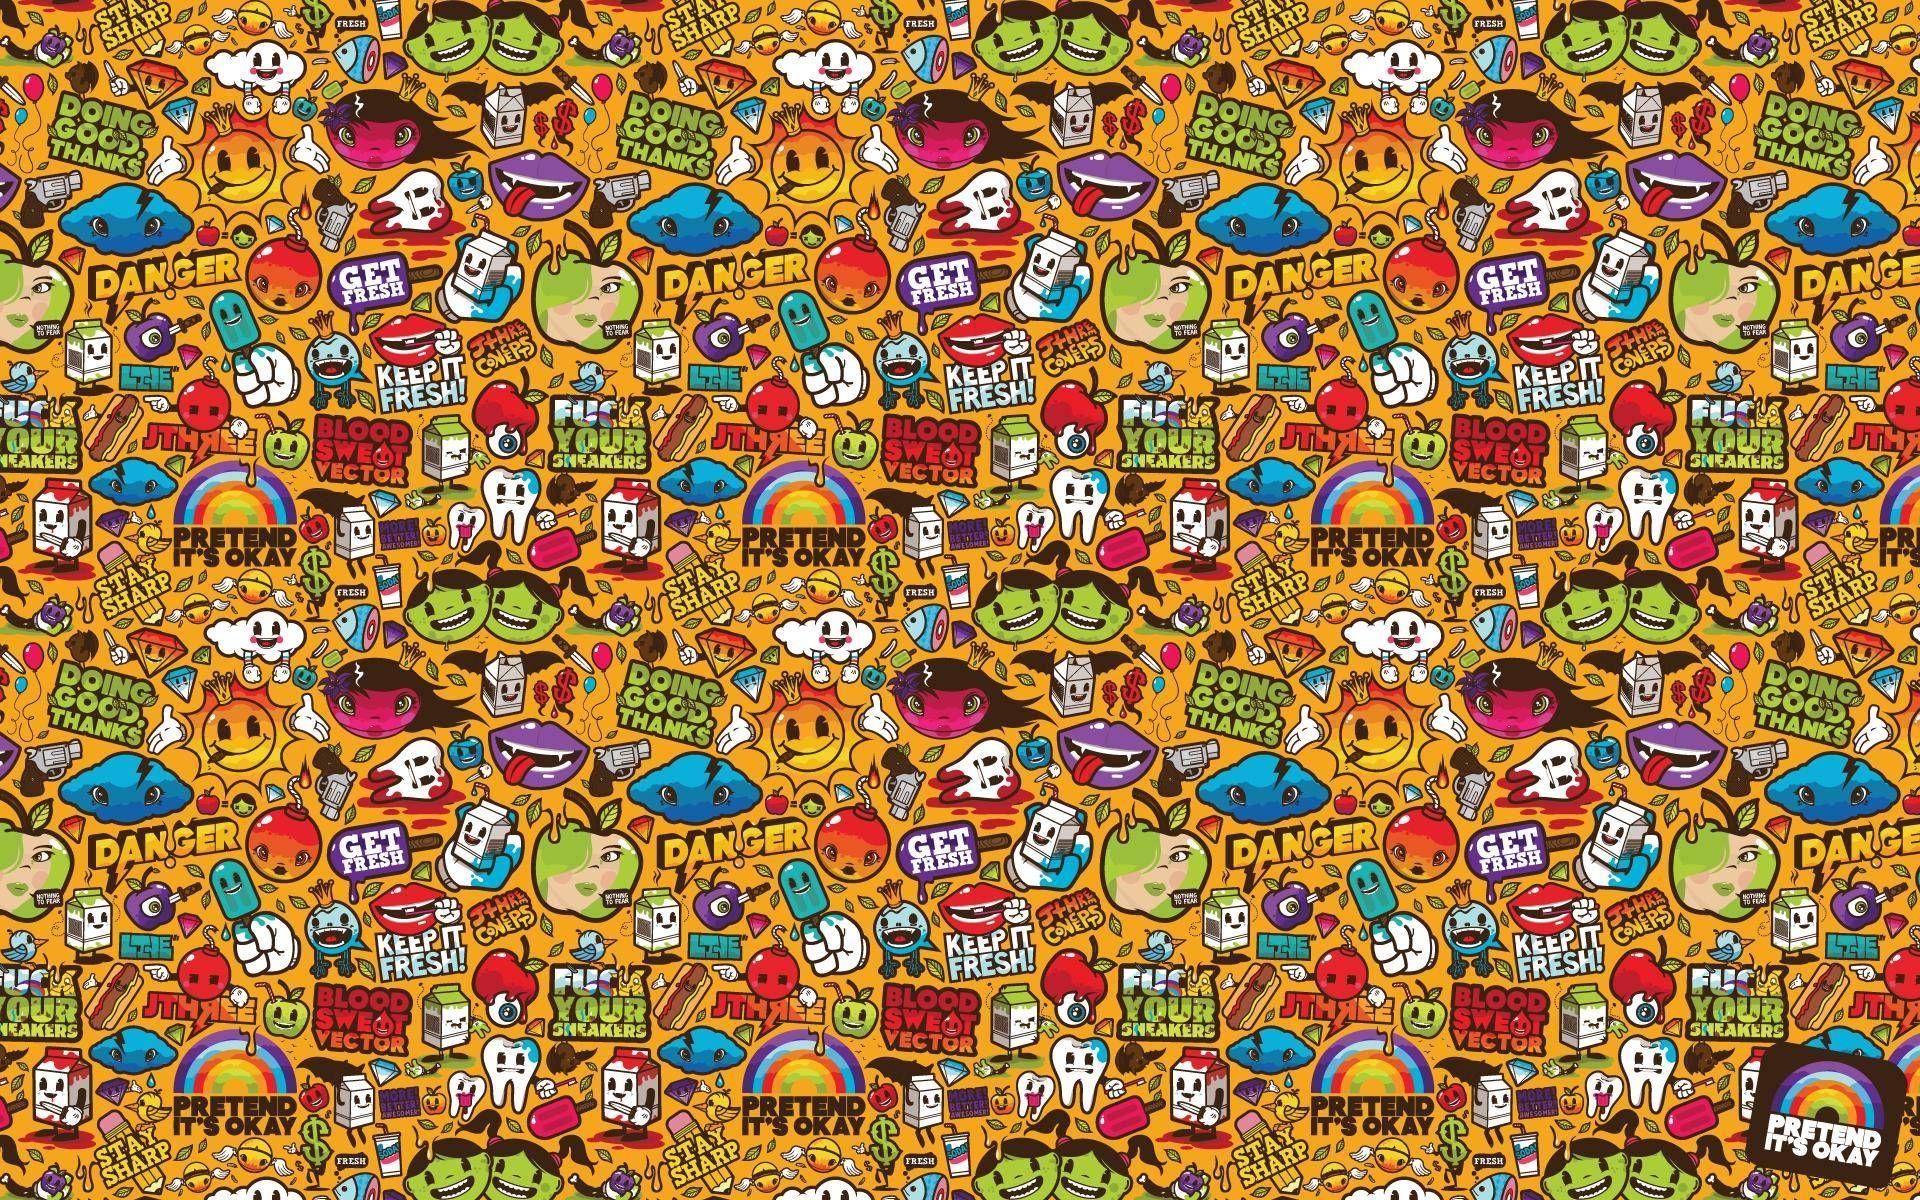 Good Wallpaper High Quality Trippy - dd542400e2e0cafe4d06e55f786c9895  You Should Have_204635.jpg